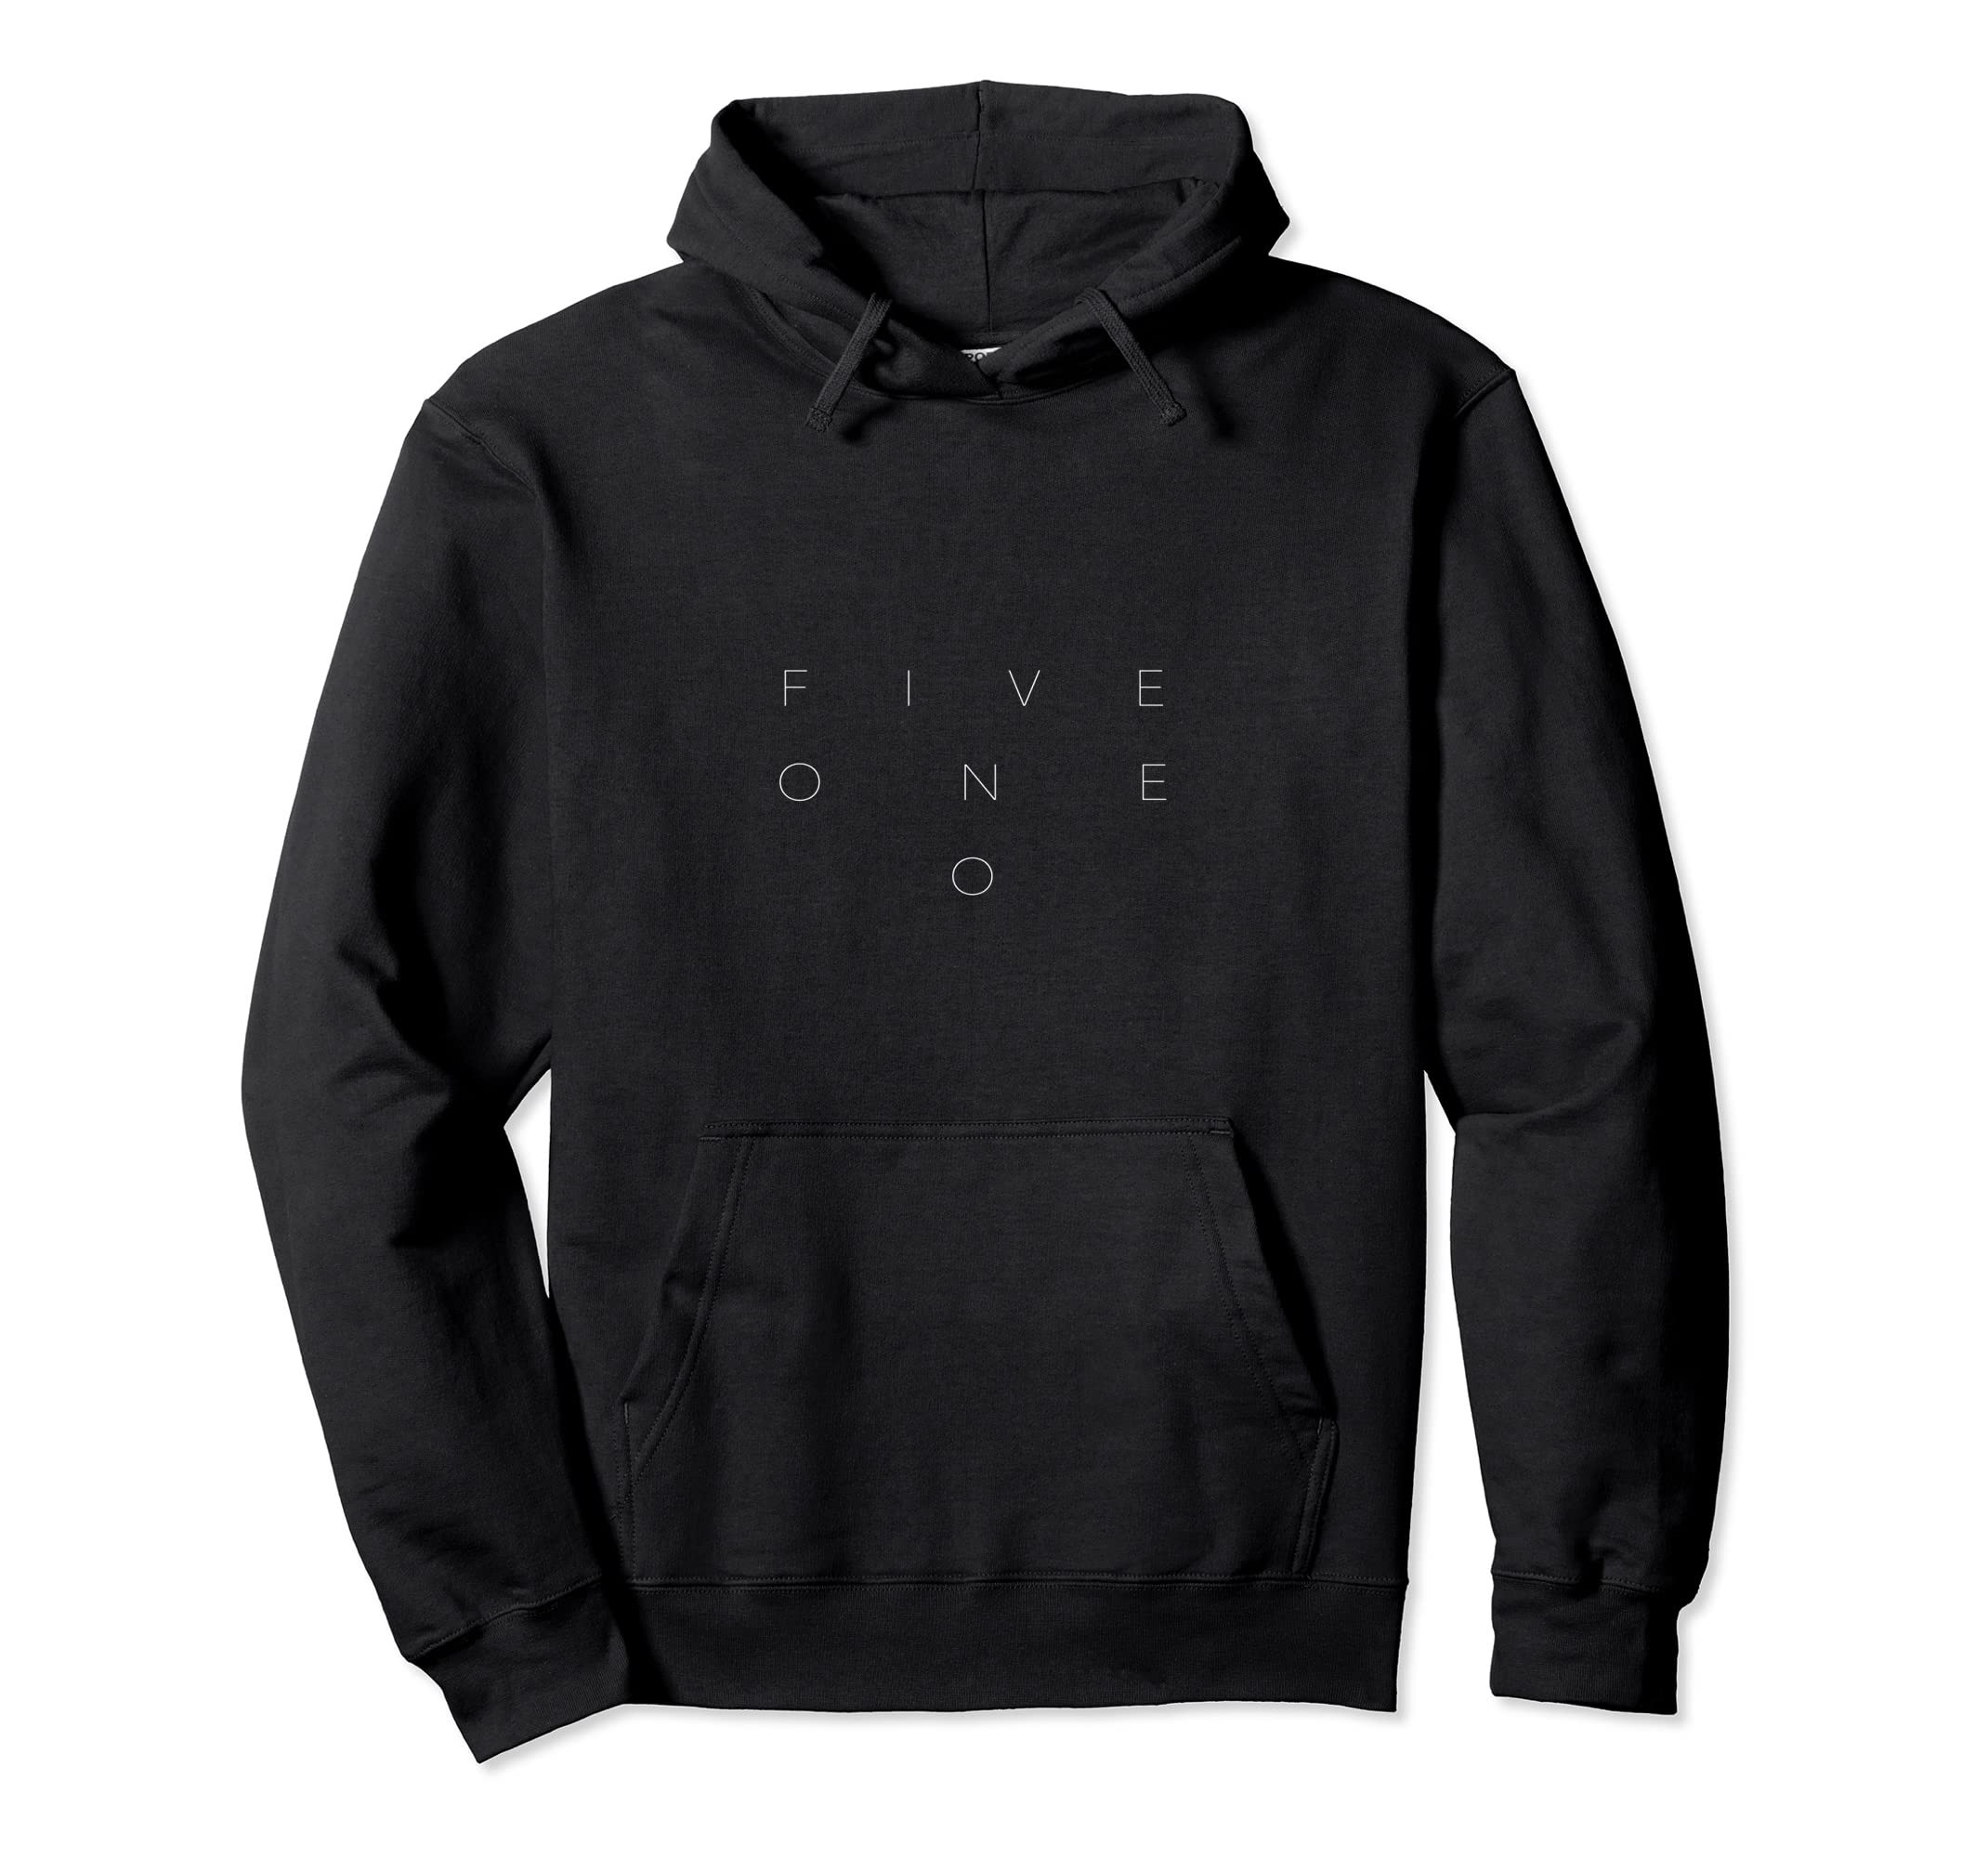 510 Area Code California Hoodie Sweatshirt Five One O